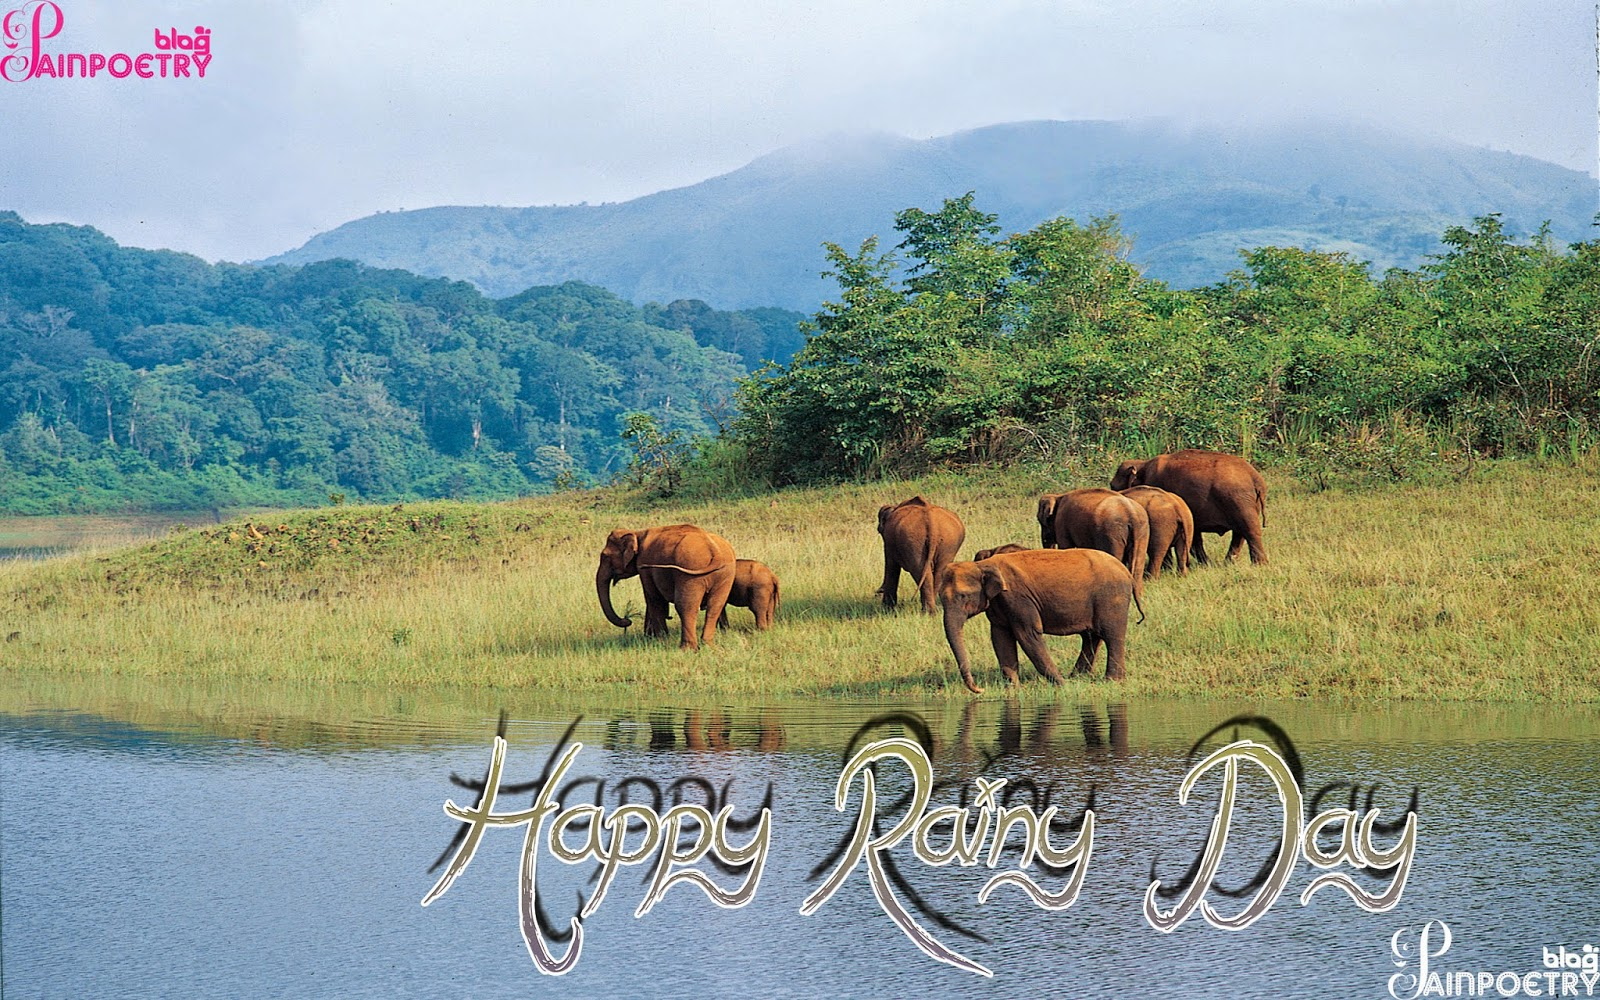 Rainy-Day-Happy-Raini-Day-Pics-Raini-Day -Image-Wallpaper-HD